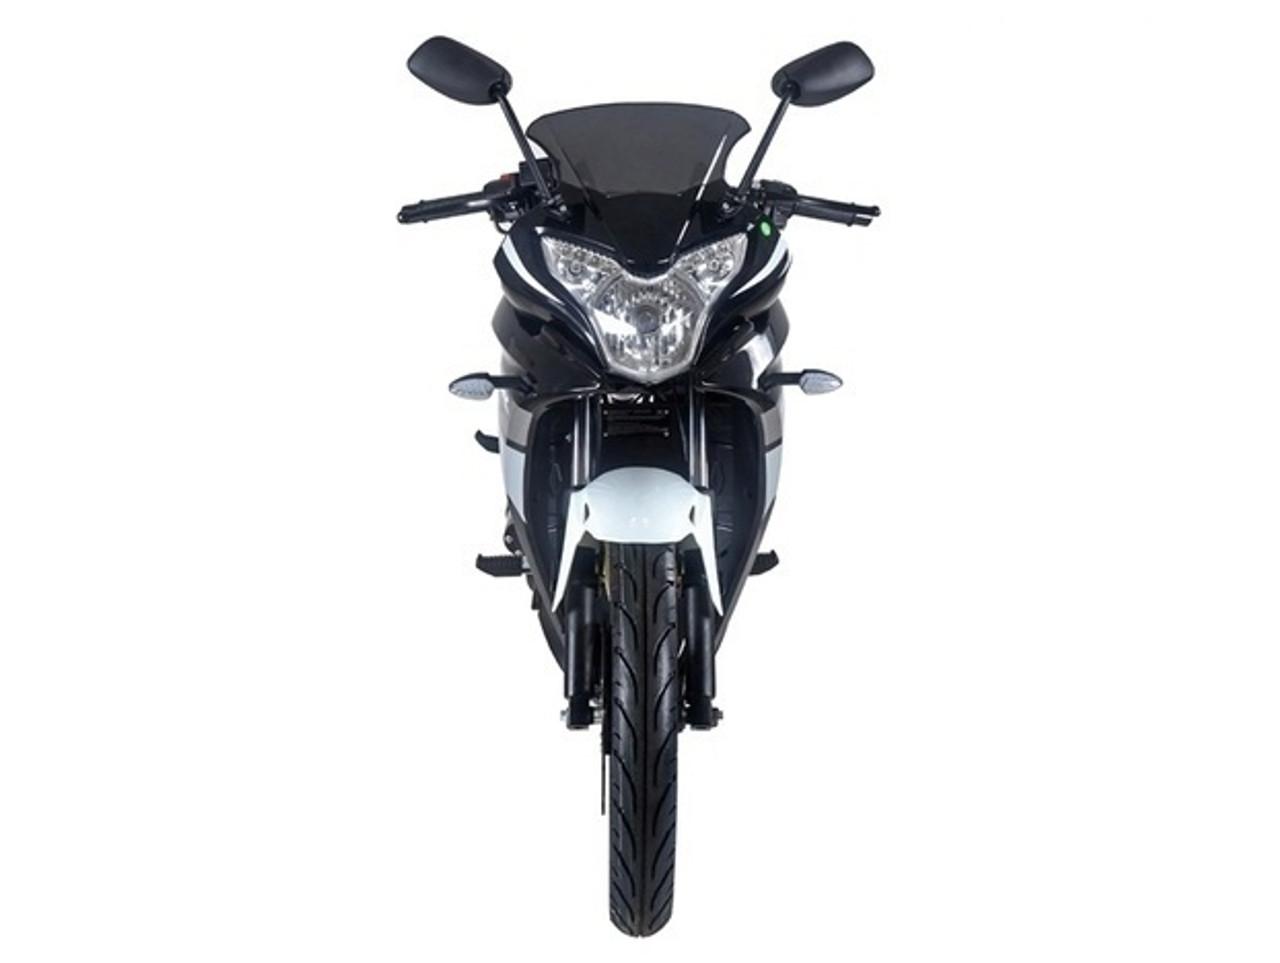 Taotao Racer50 49cc Fully Automatic Sports,  Electric with Keys, Kick Start Back up Bike